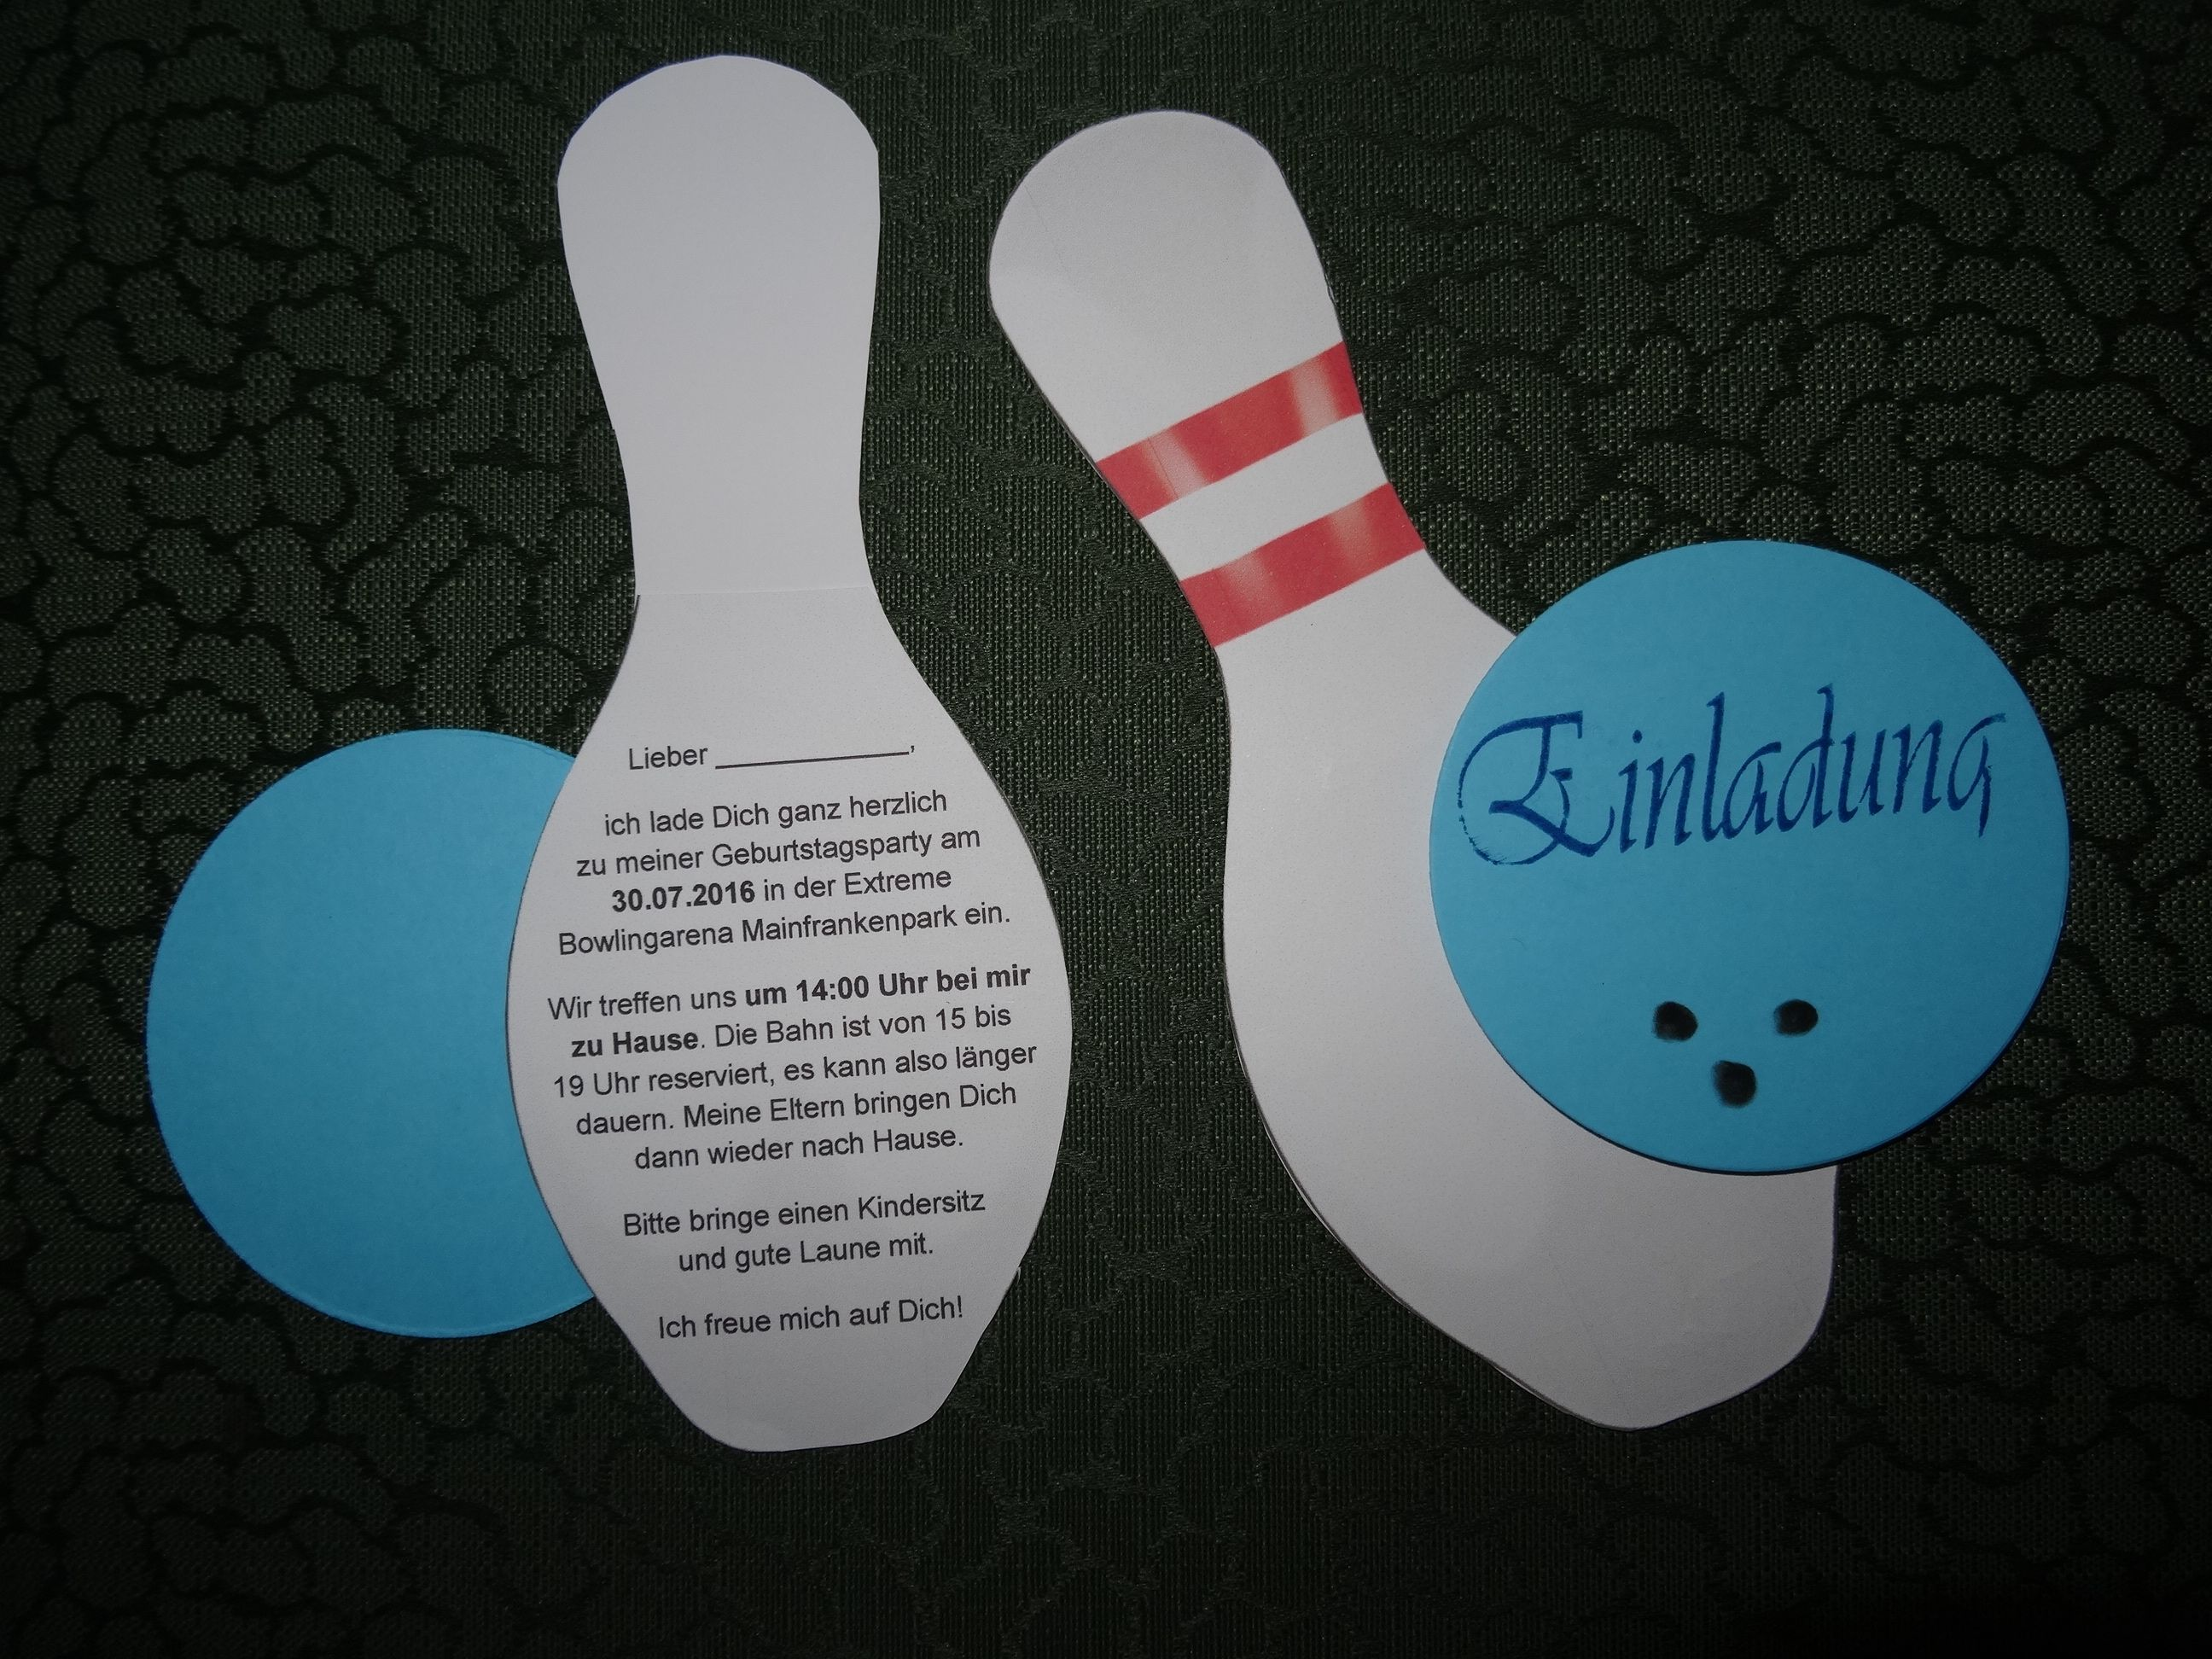 einladung geburtstag kindergeburtstag bowlingparty, Einladung